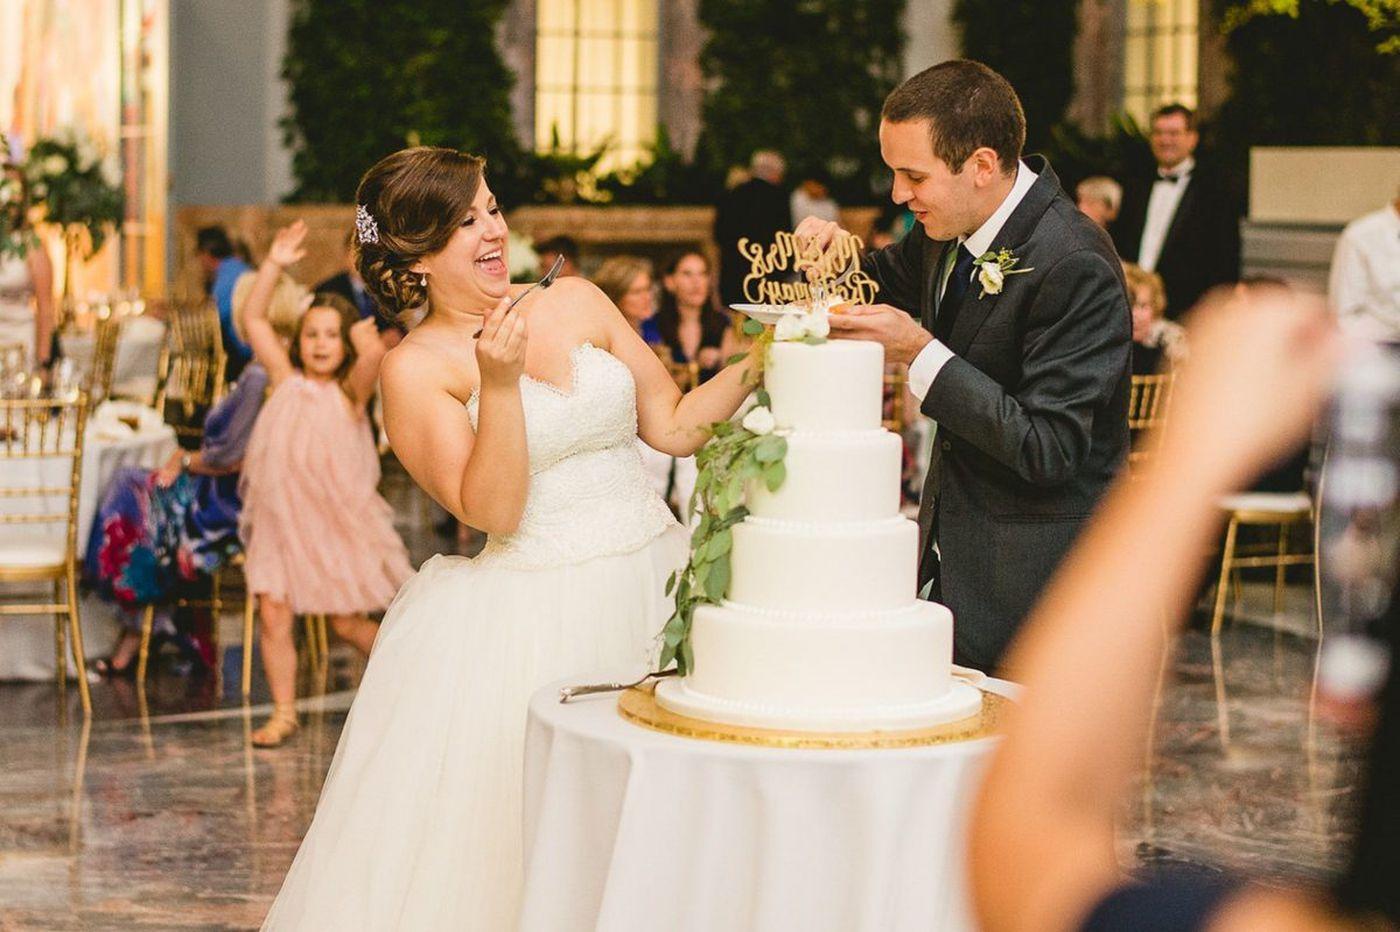 Weddings: Kasia Kordas and Christopher Roithmayr